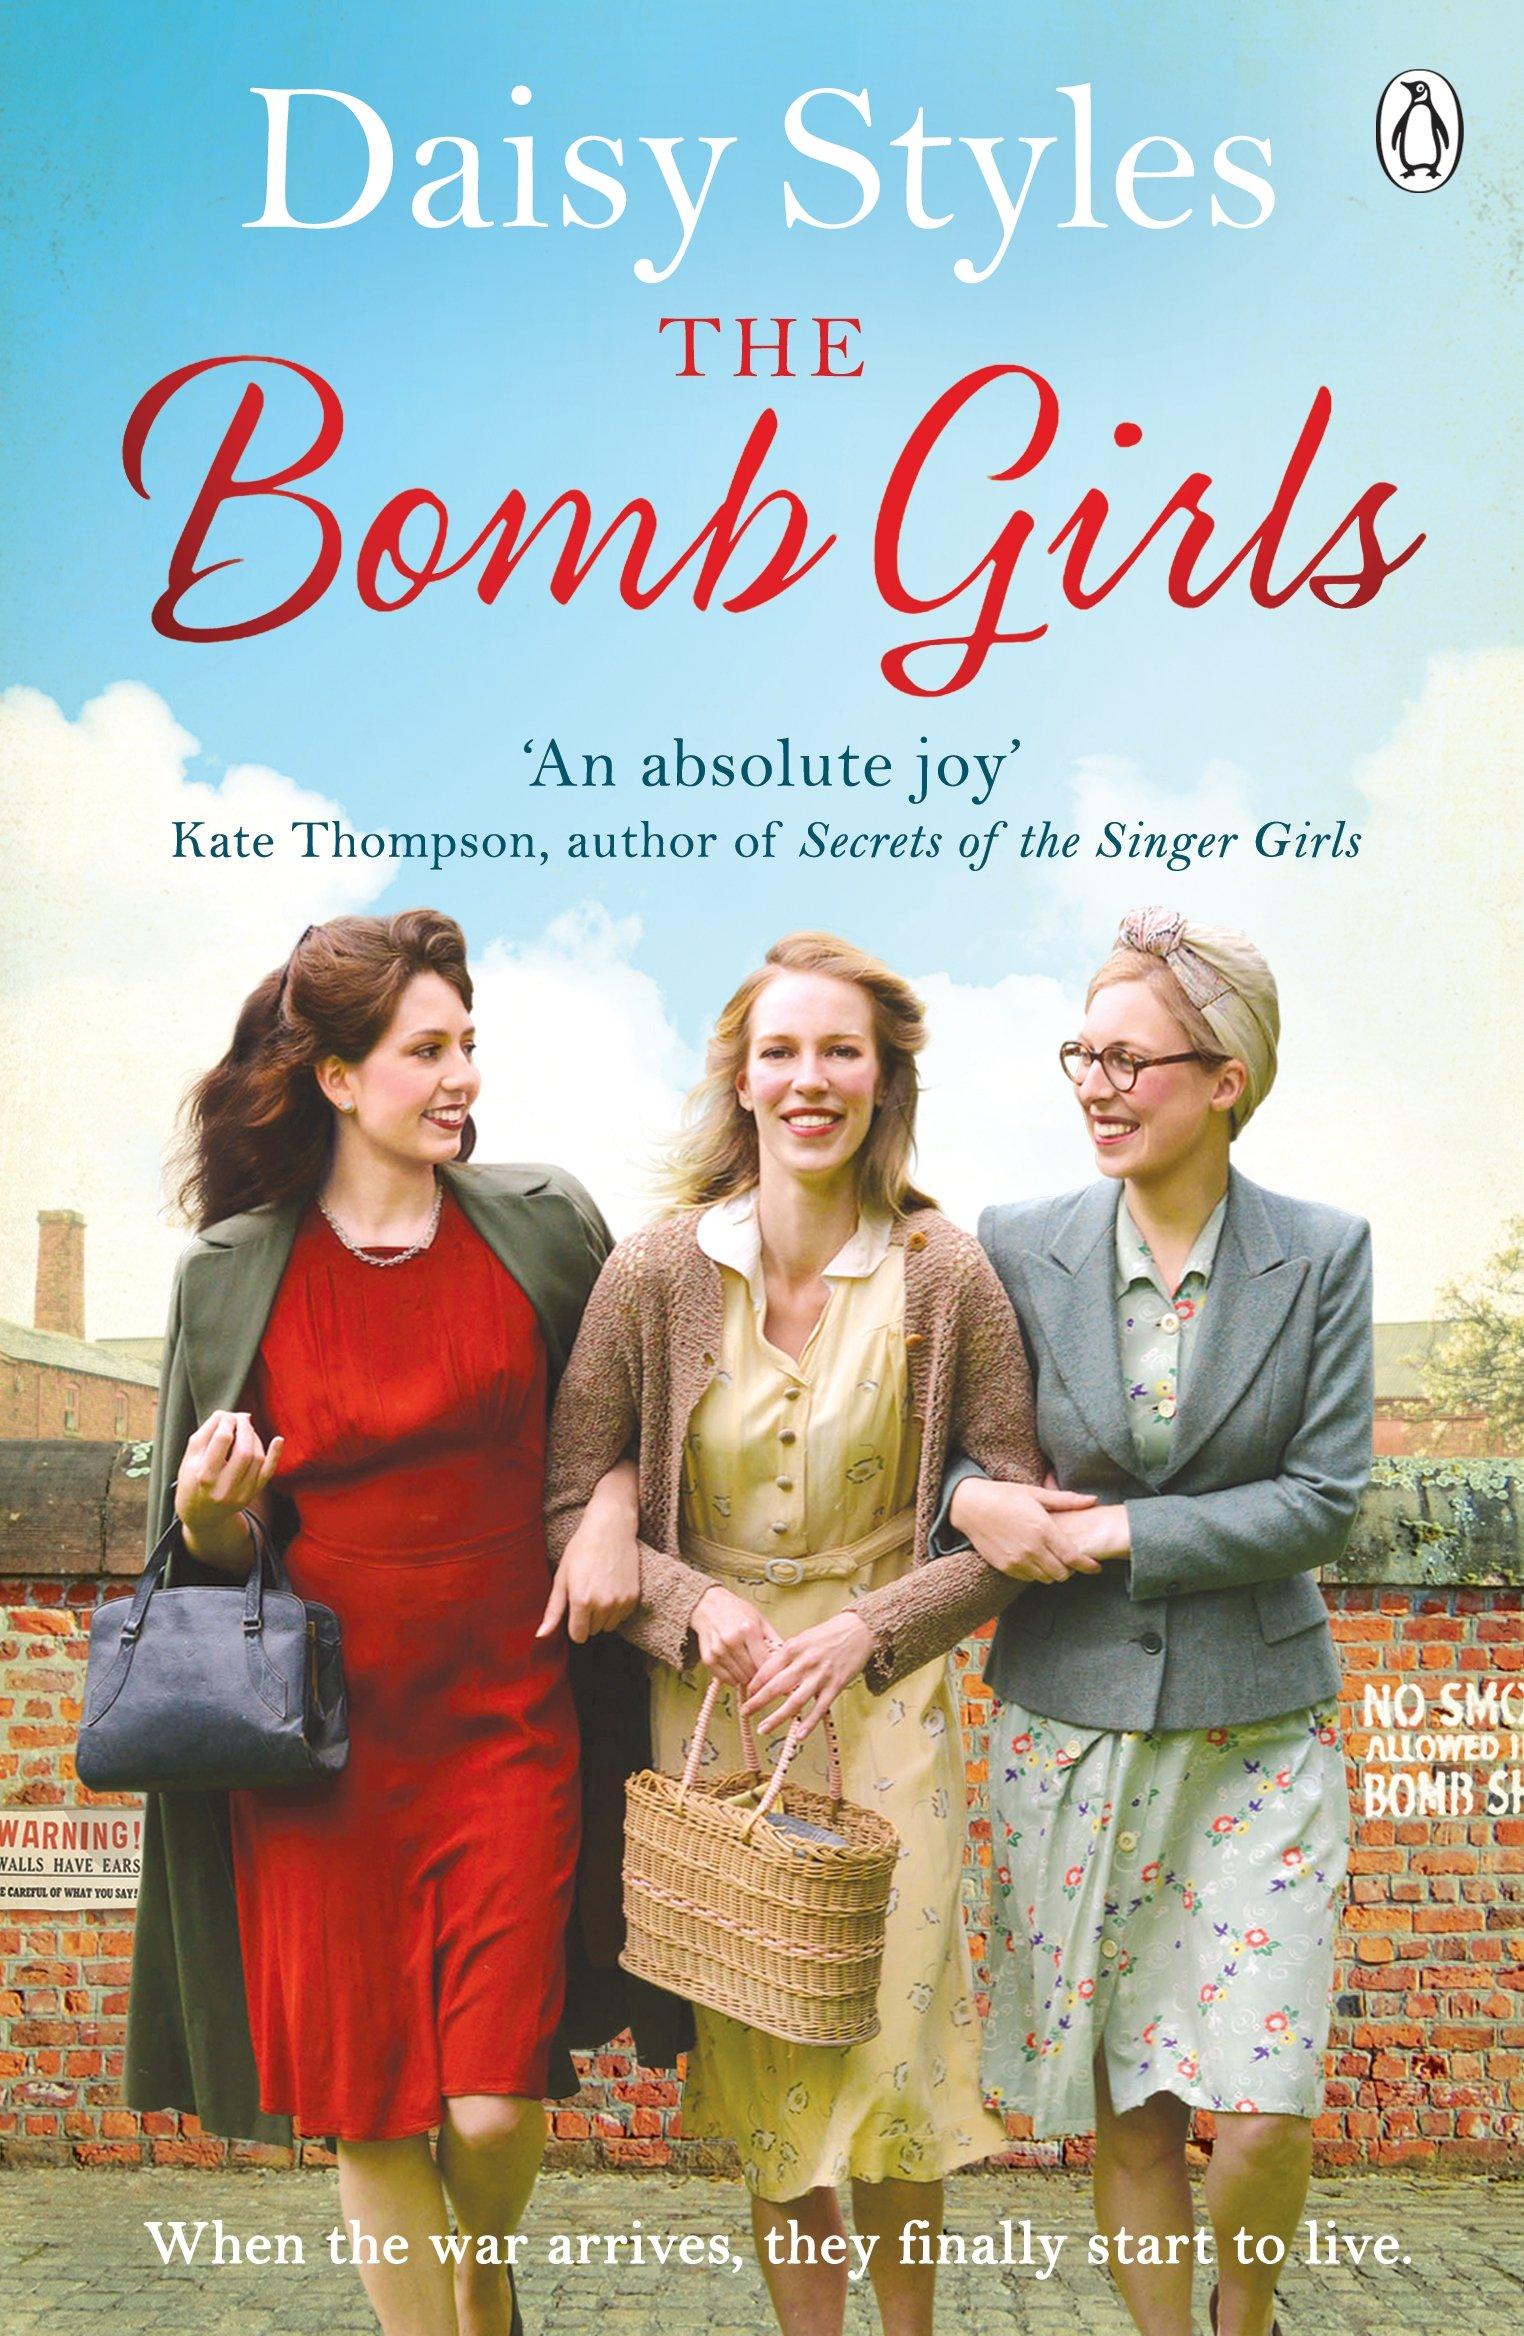 The bomb girls bomb girls 1 amazon daisy styles the bomb girls bomb girls 1 amazon daisy styles 9781405926171 books fandeluxe Choice Image